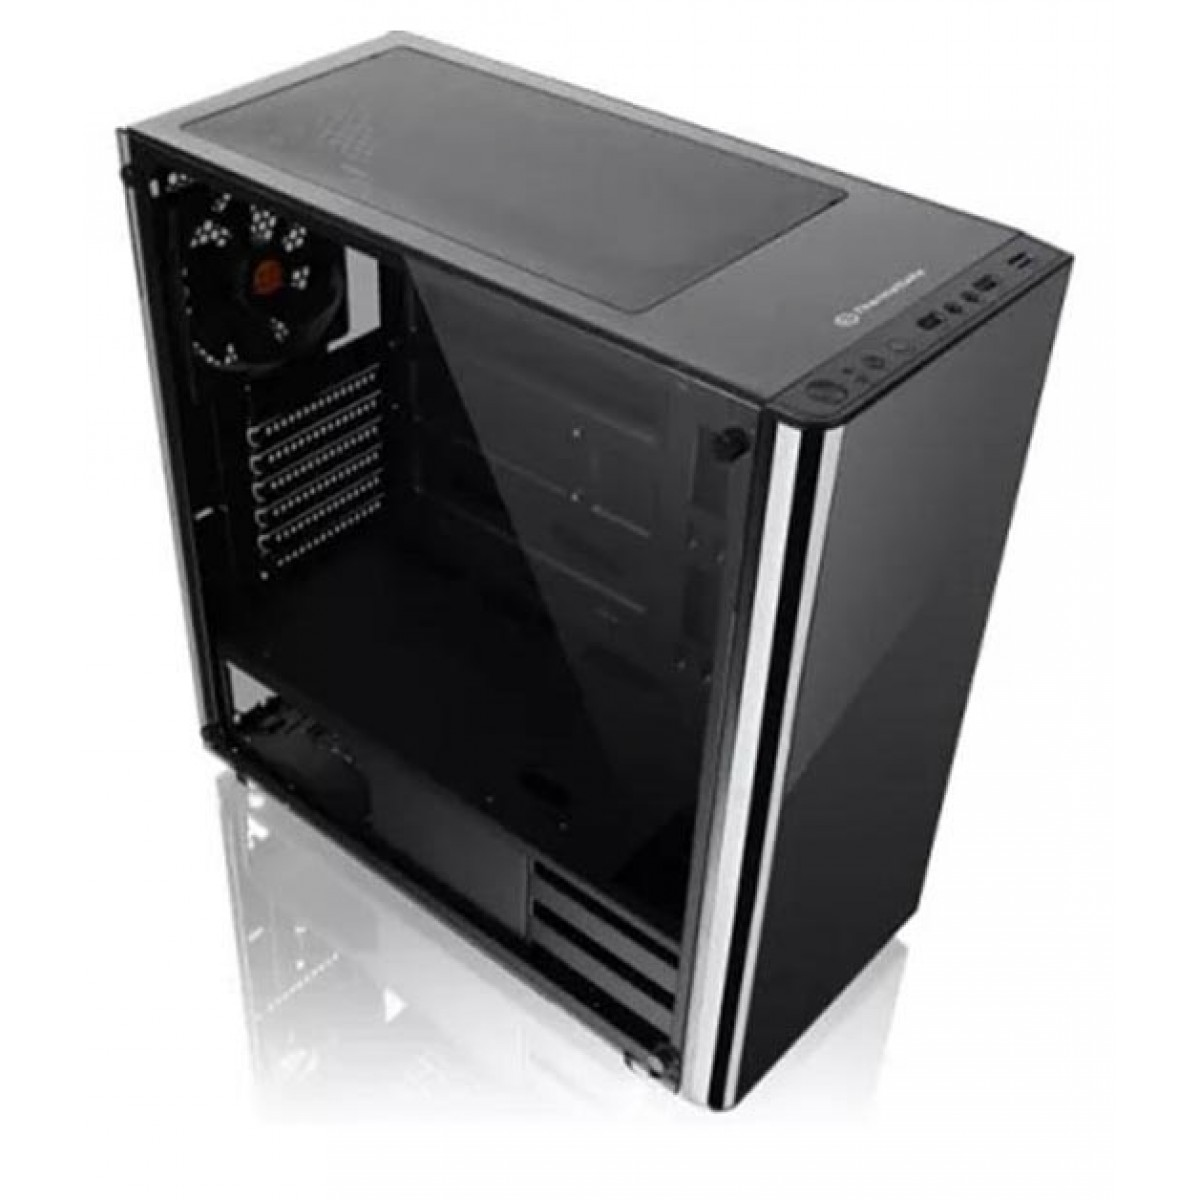 Gabinete Gamer Thermaltake V200, Mid Tower, Sem Fan, Vidro temperado, Black, Com Fonte 500W, CA-3K8-50M1WZ-01